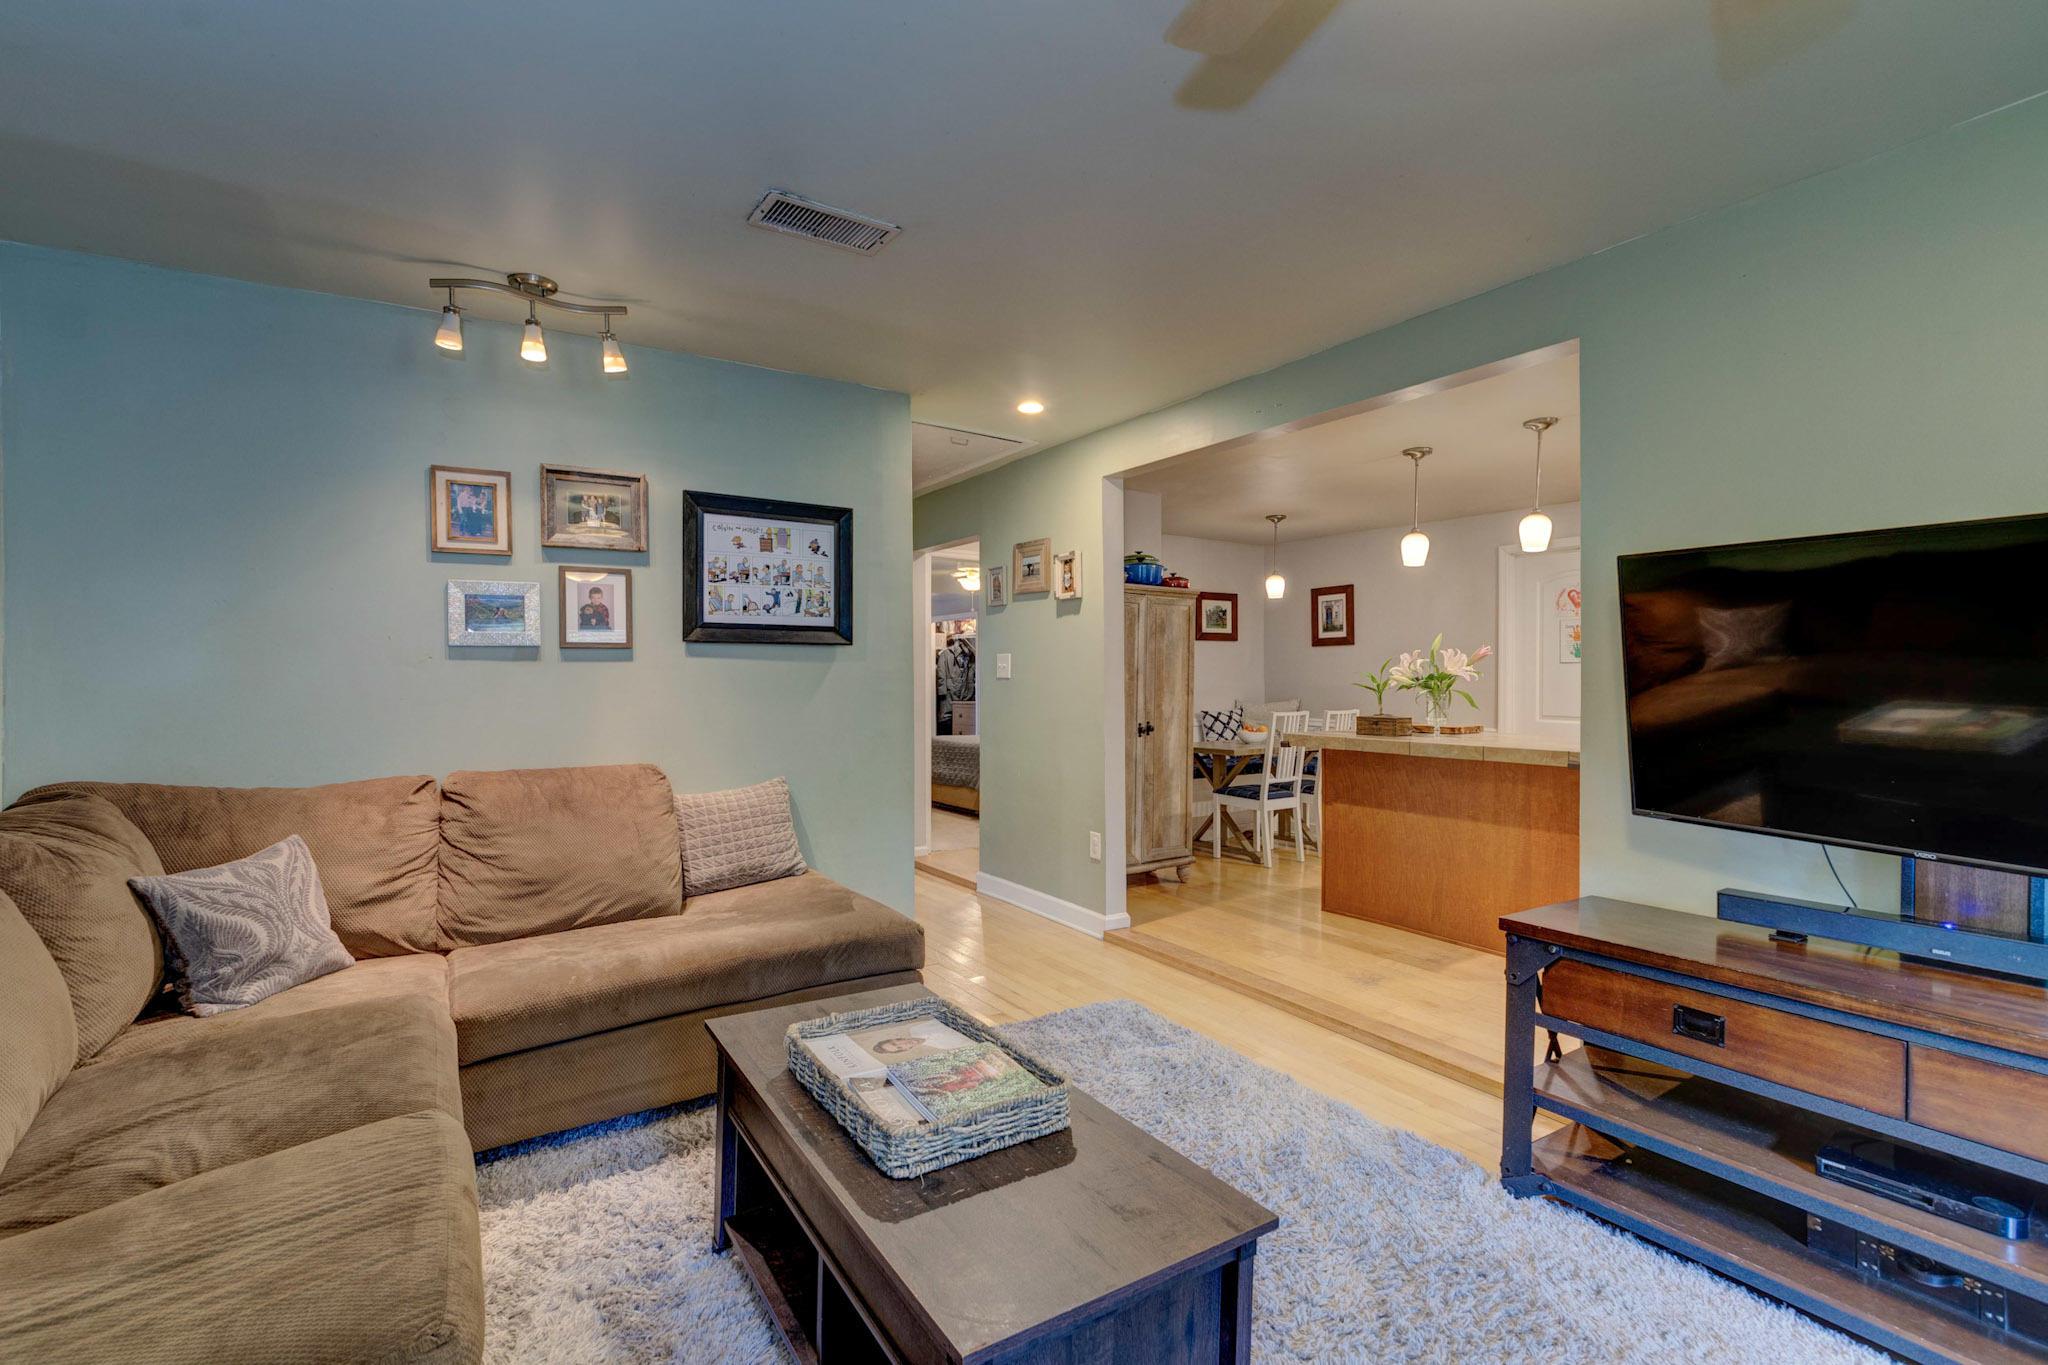 St Andrews Homes For Sale - 1808 2nd, Charleston, SC - 14